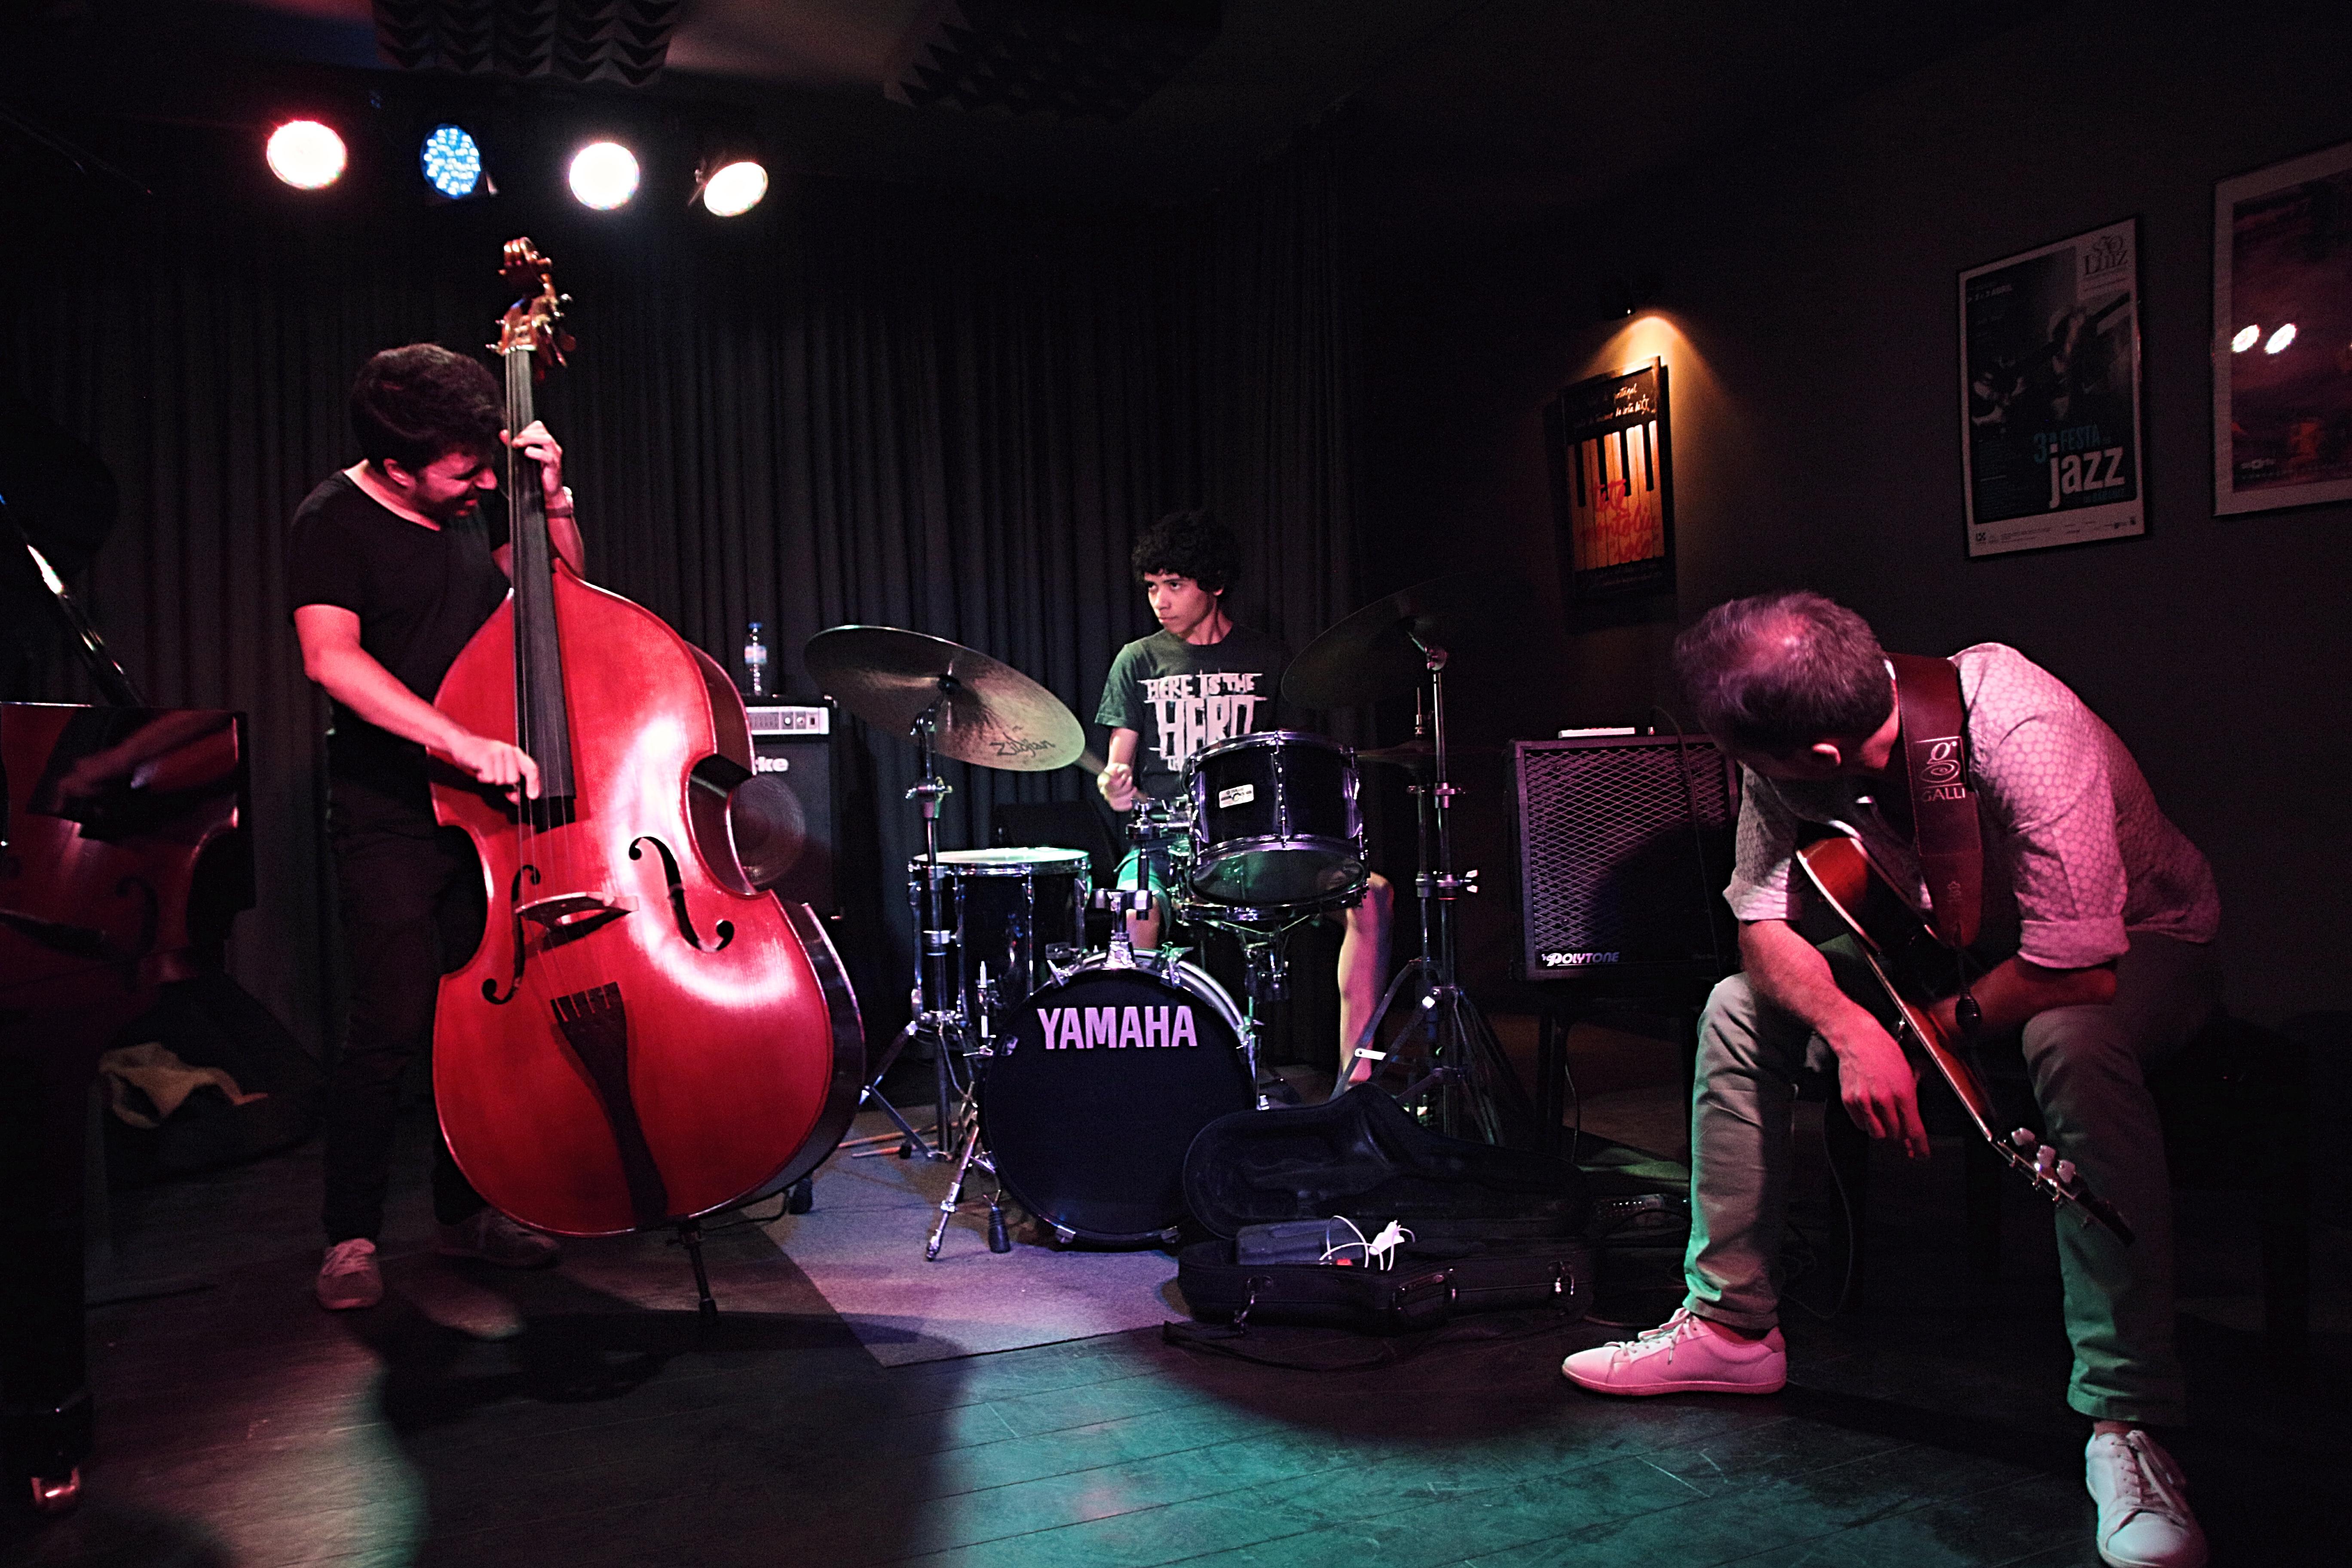 #jazzjam #HotClubLisbon